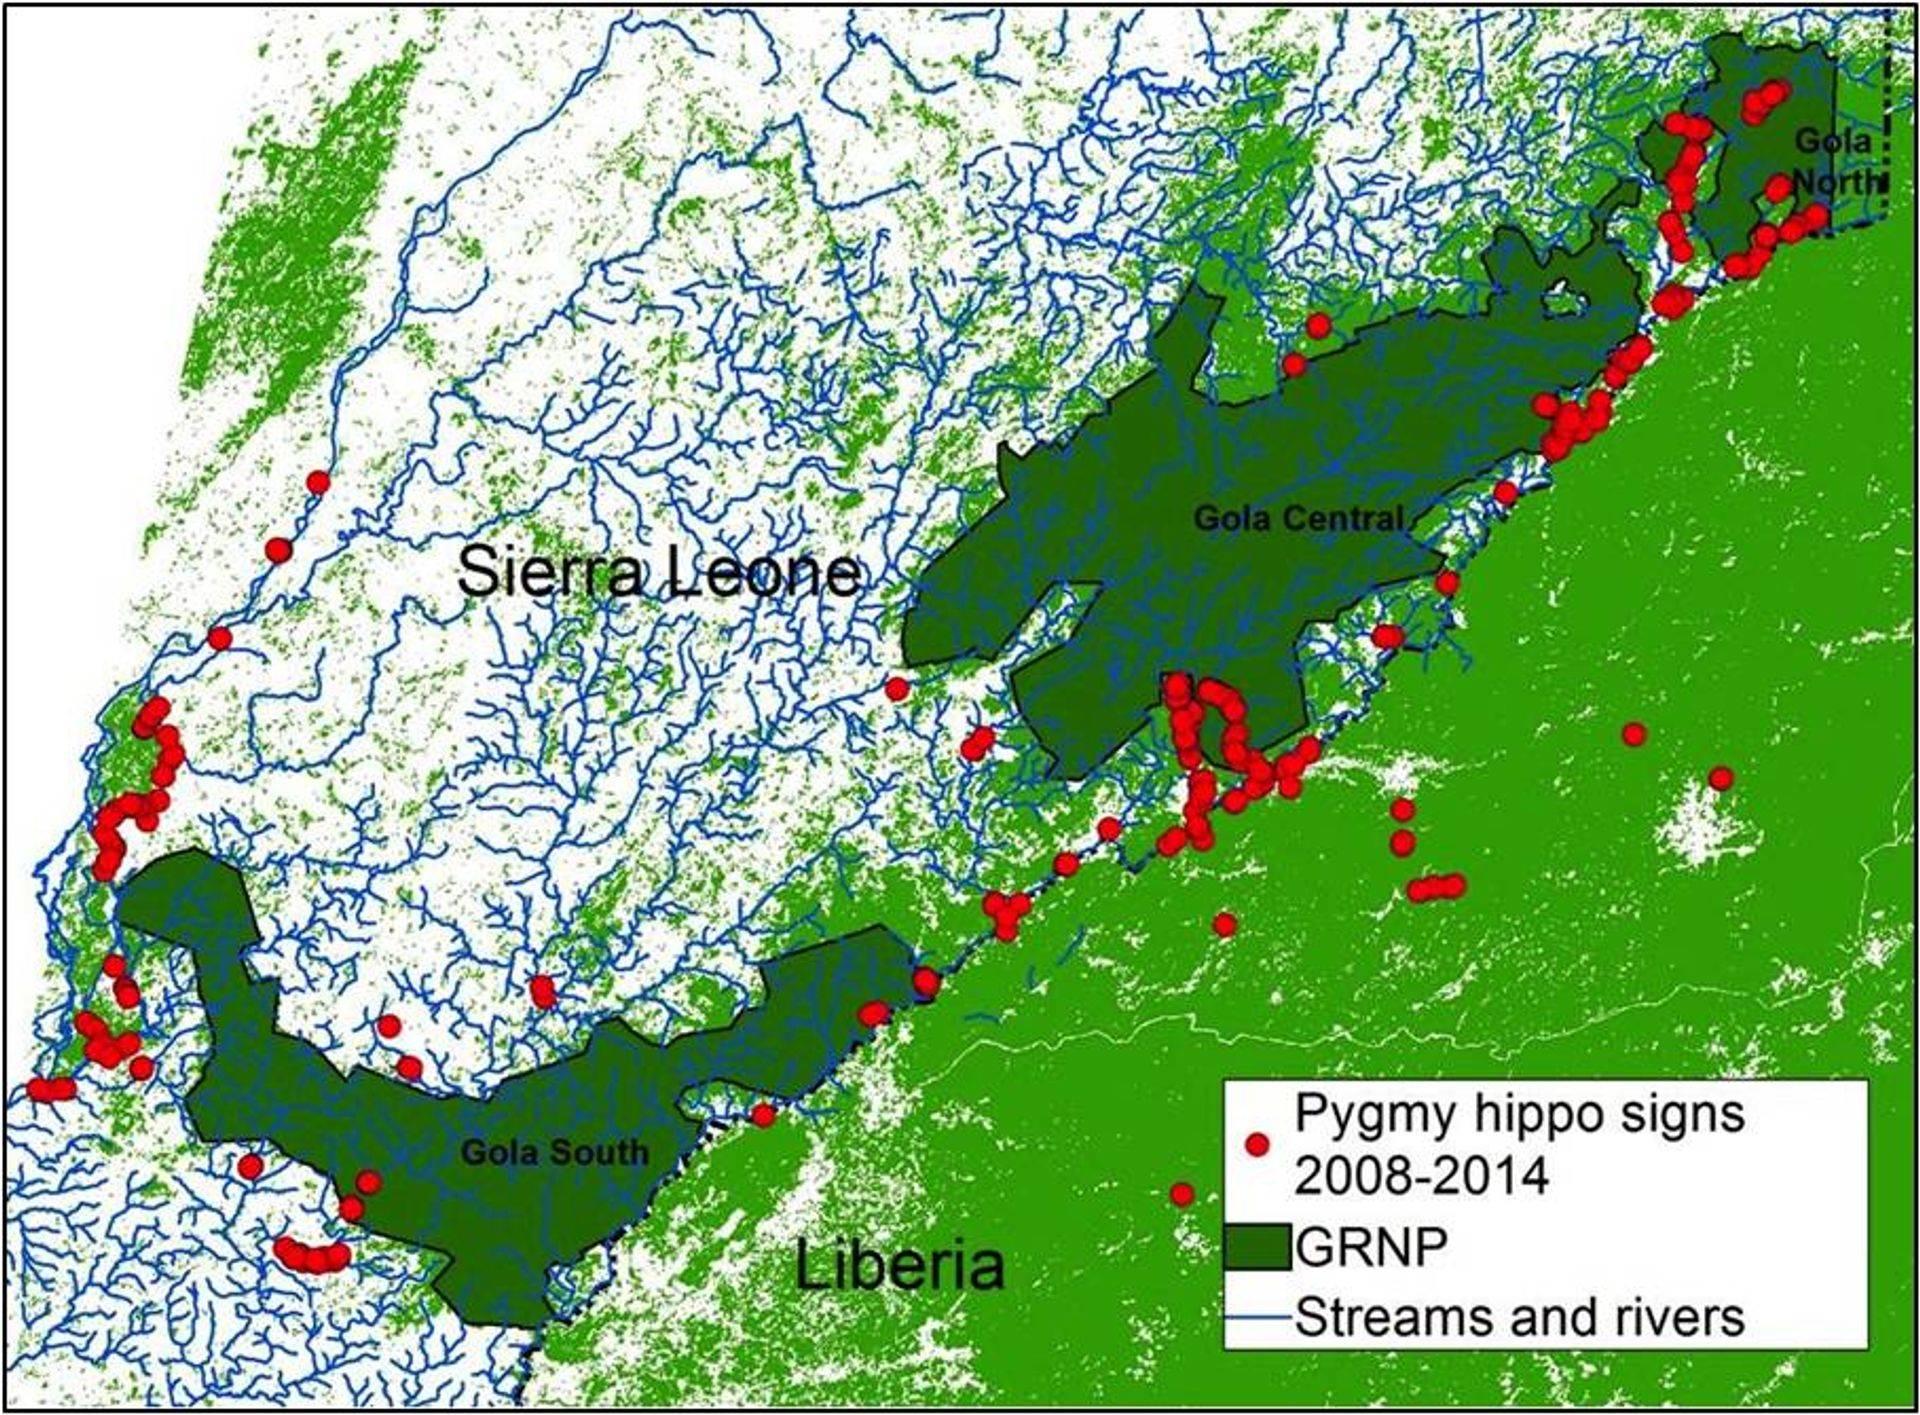 PygmyHippo research2.jpg